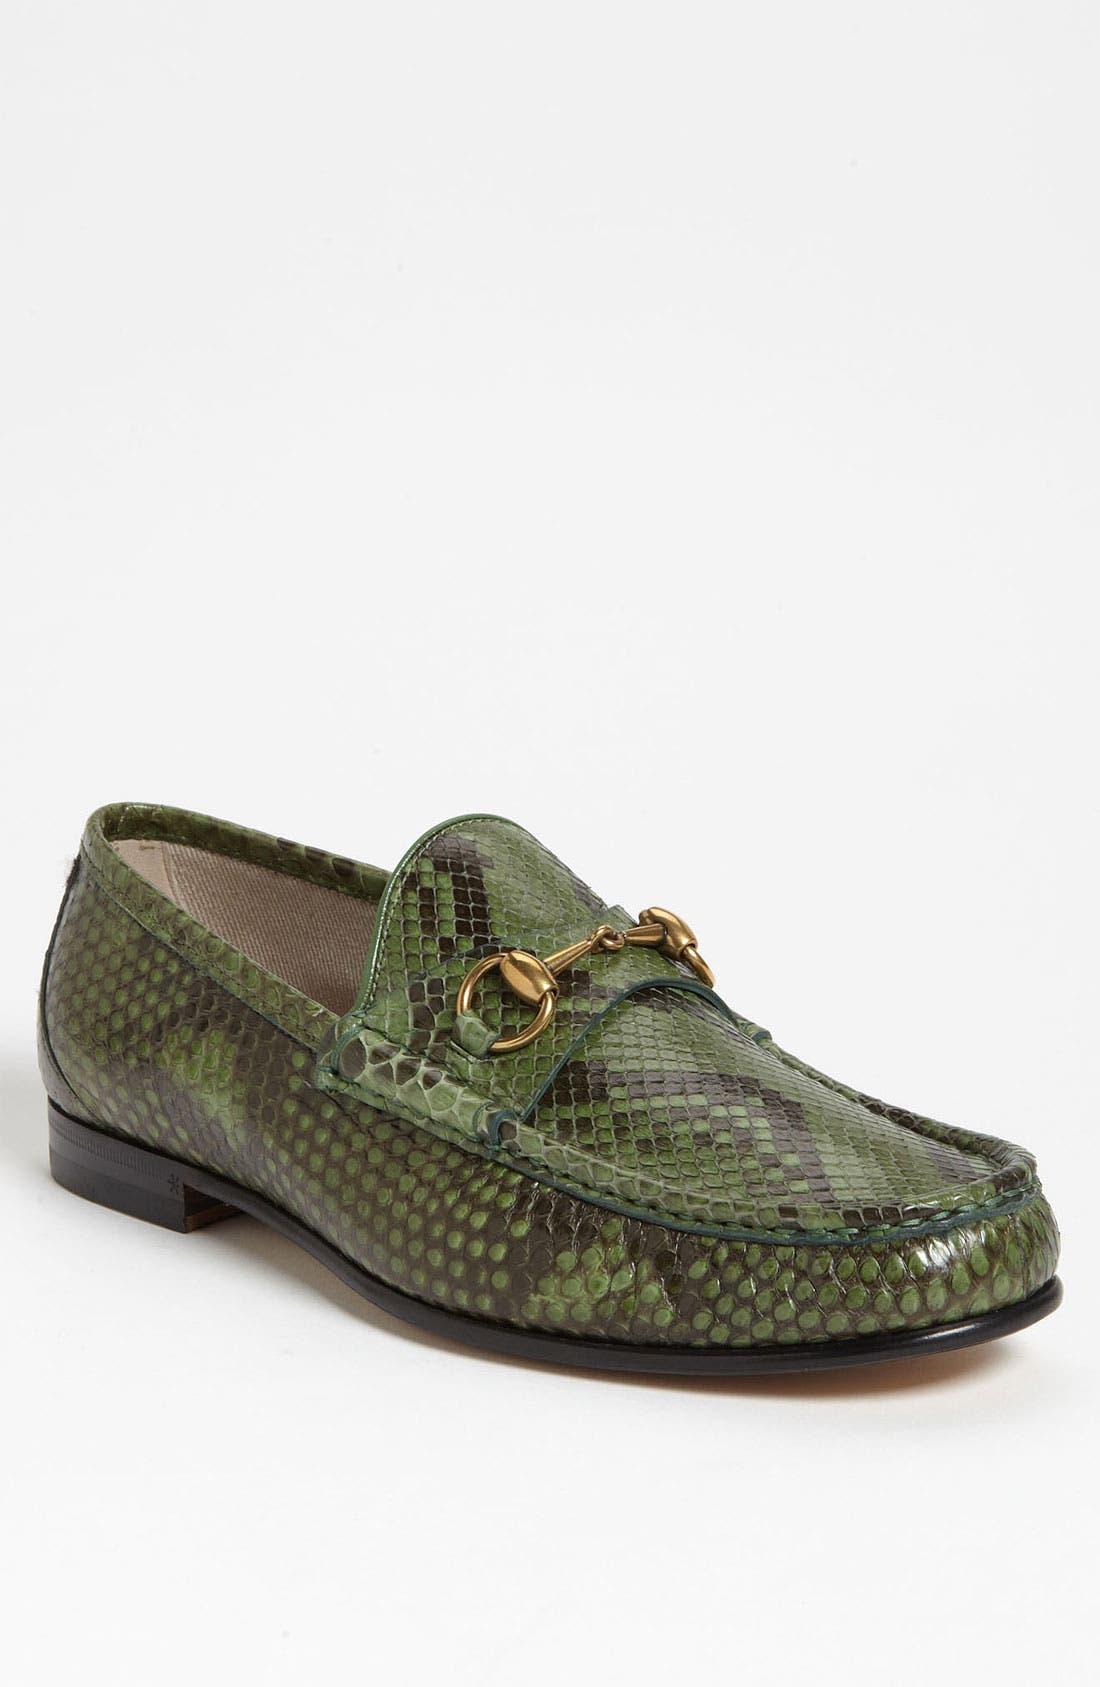 Alternate Image 1 Selected - Gucci 'Roos' Python Bit Loafer